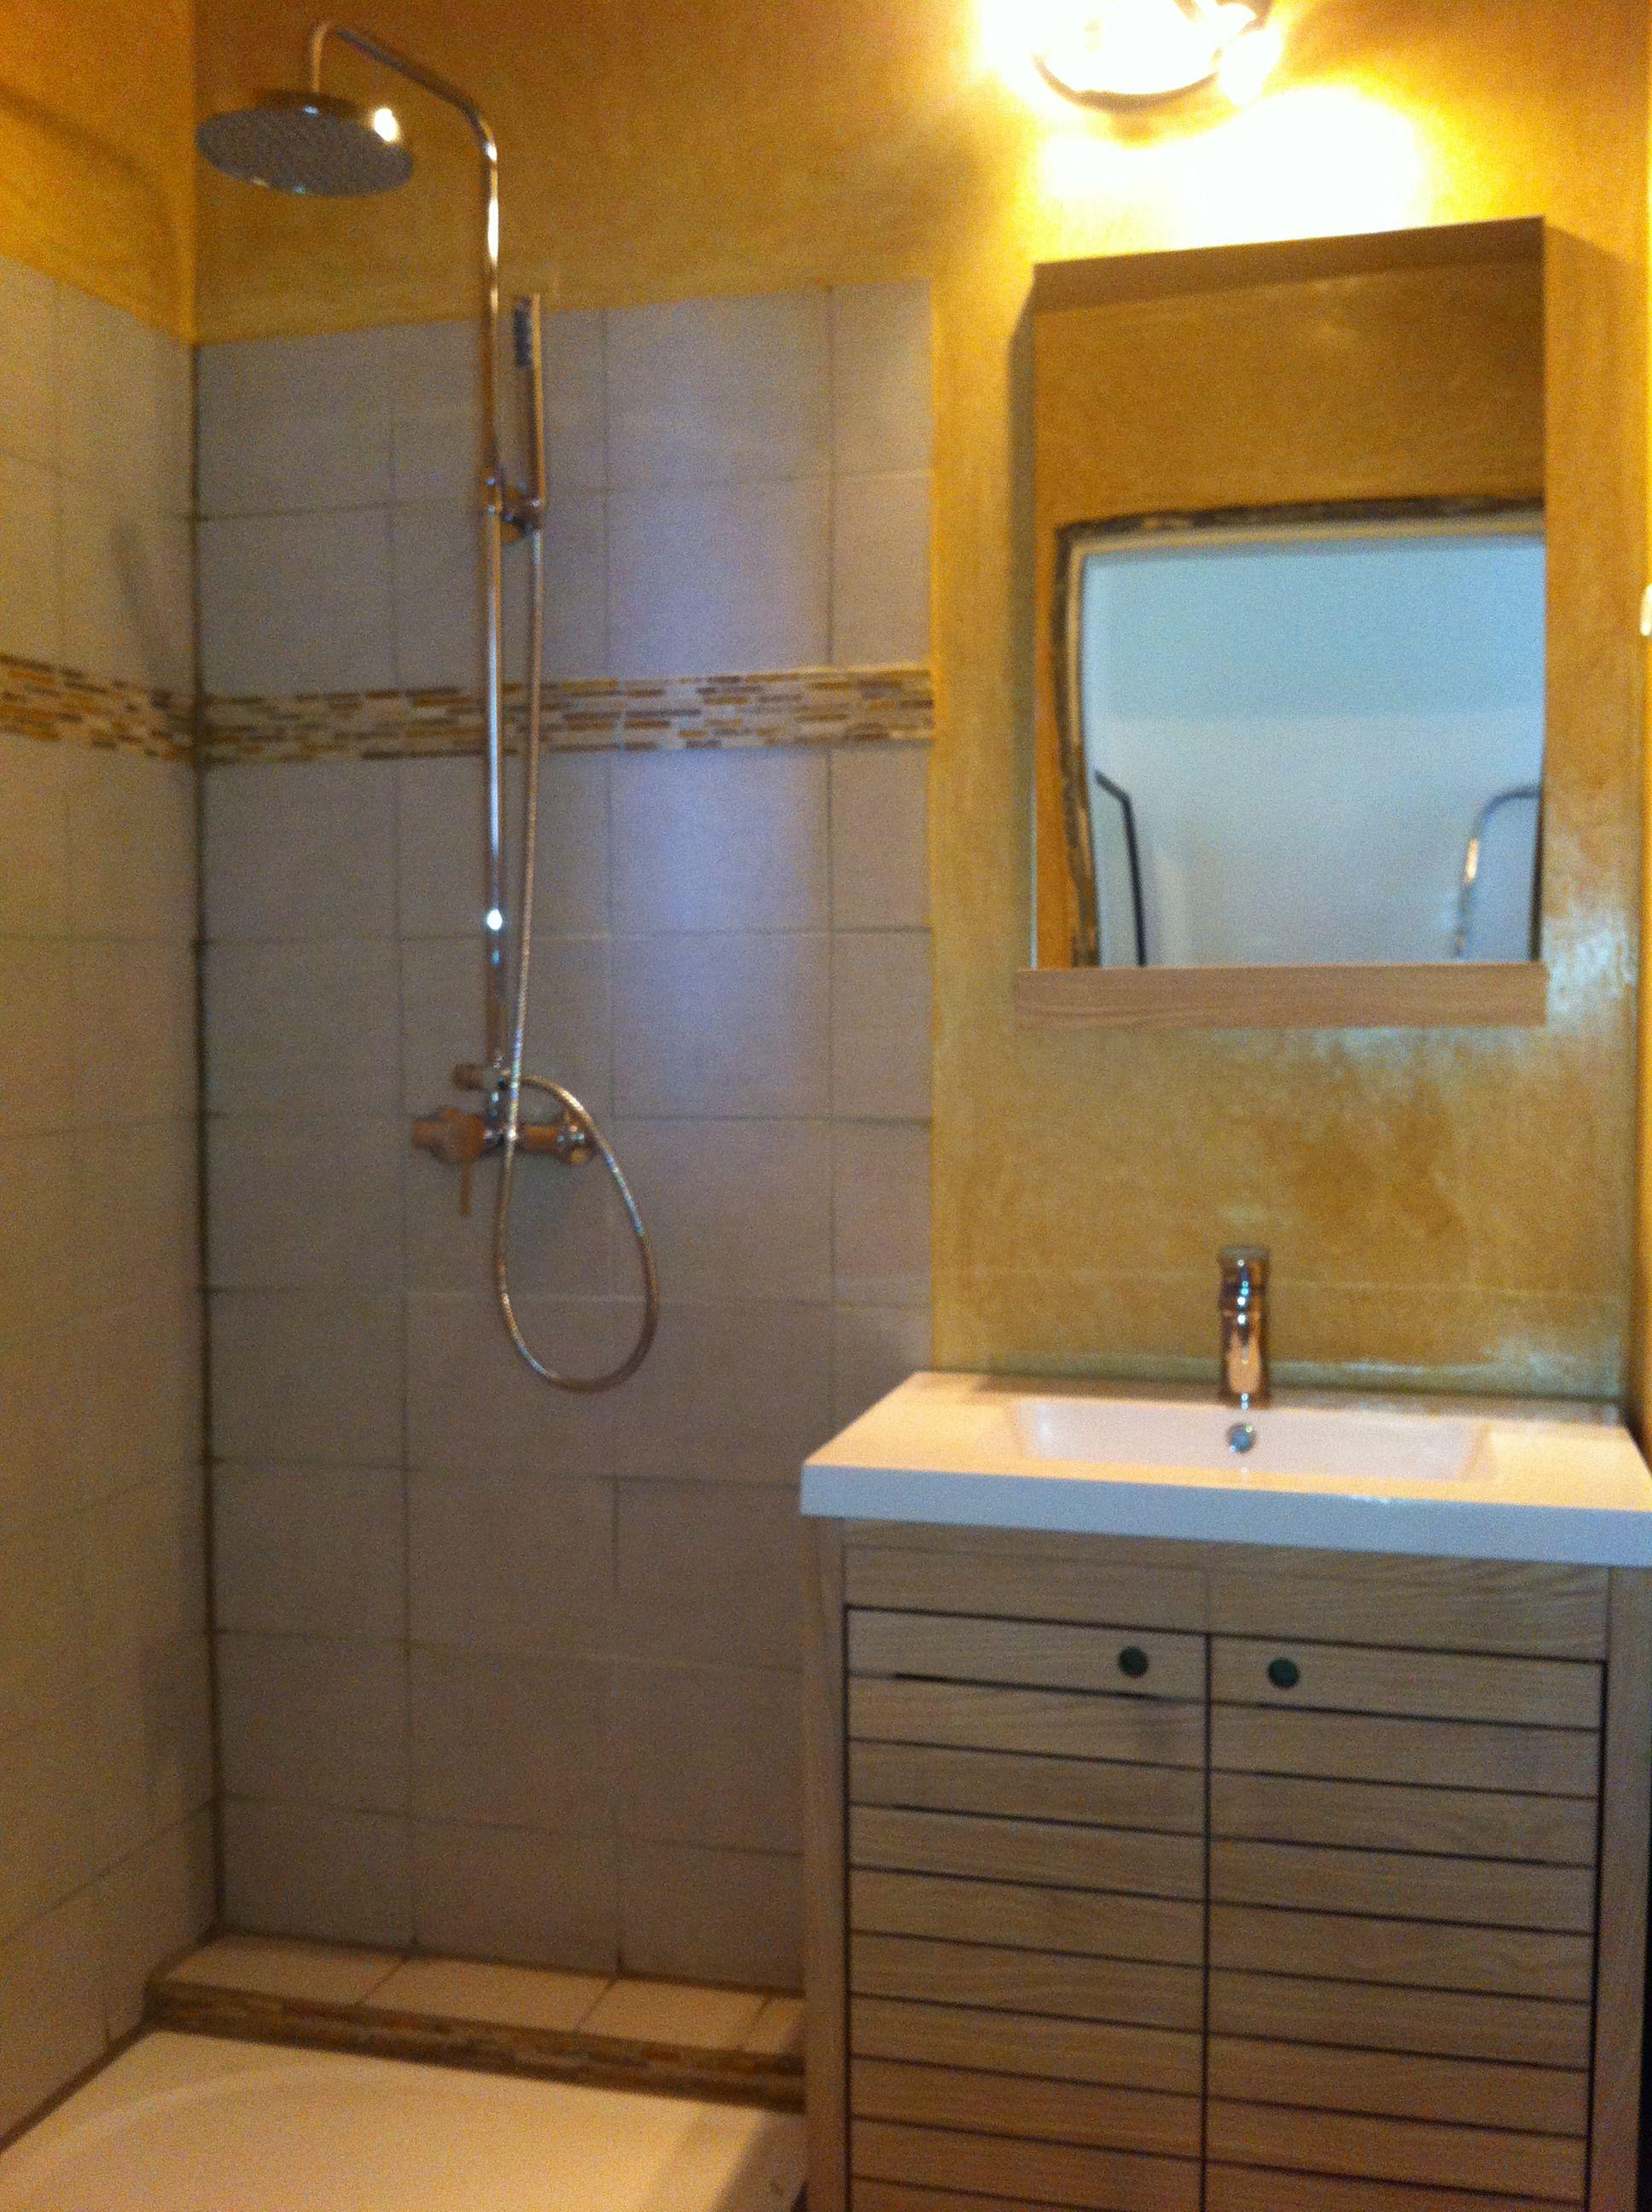 Colonne Double Salle De Bain Ikea ~ salle de bain en tadelakt chaux teinte terre de sienne ocre